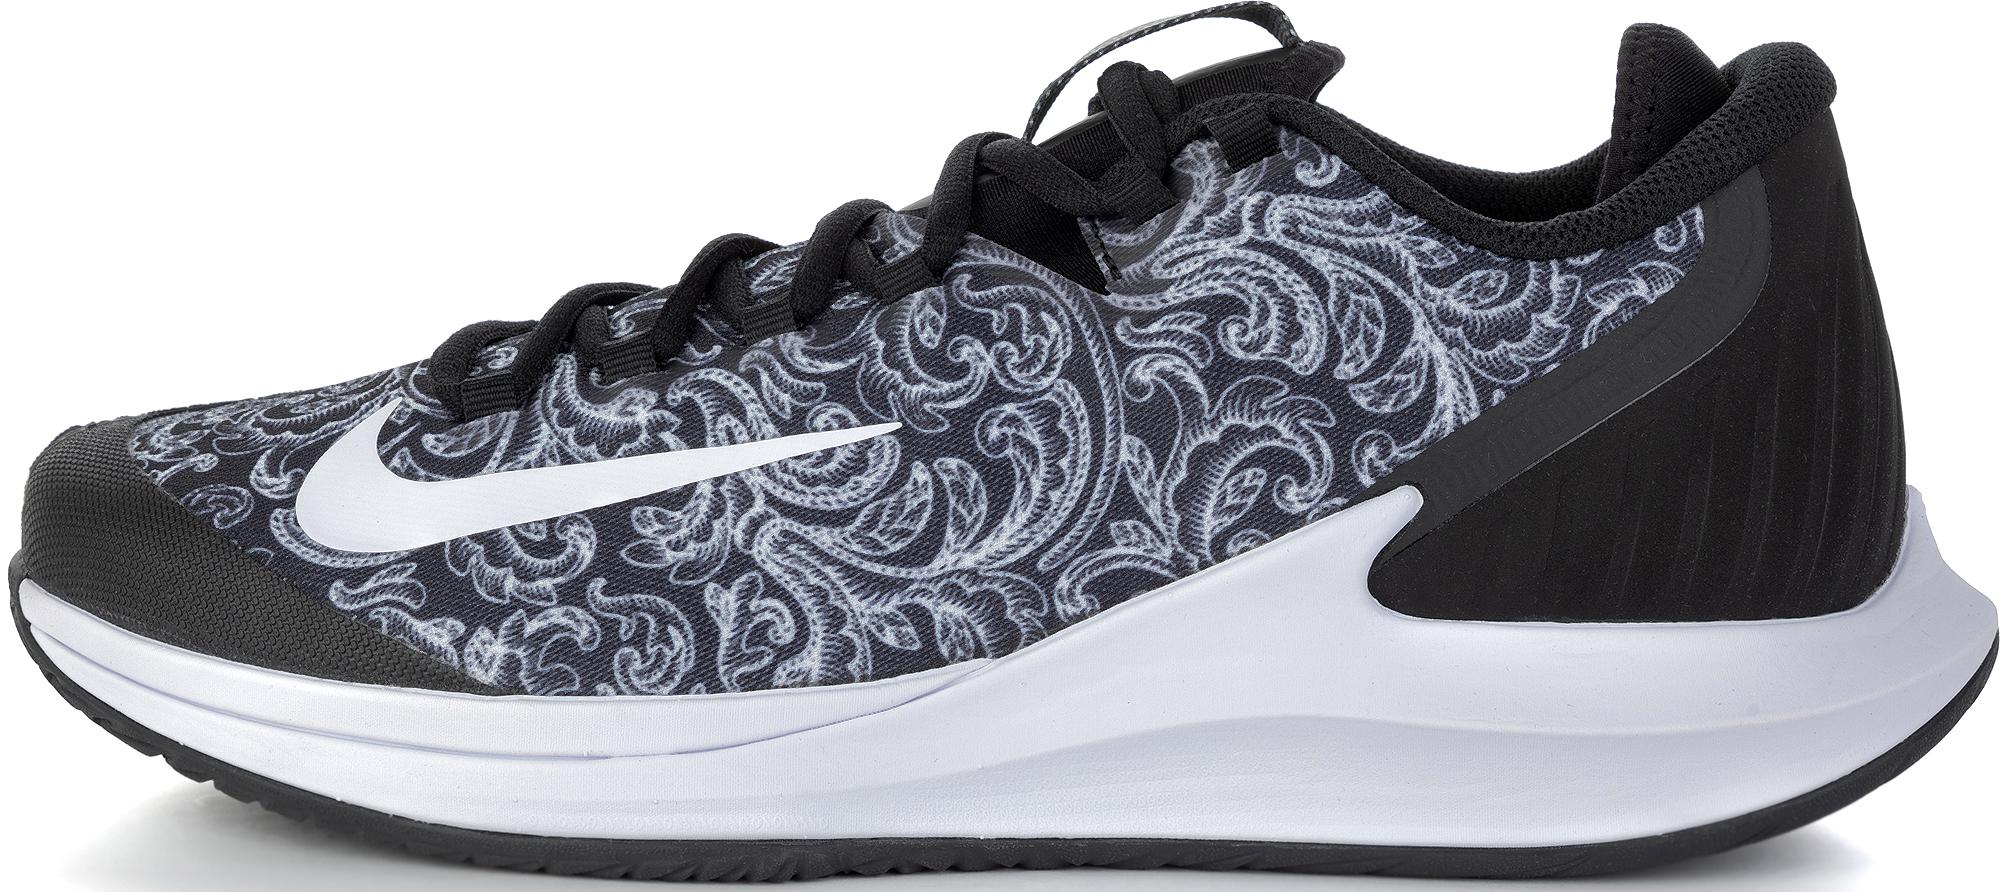 Nike Кроссовки мужские Nike Zoom Zero, размер 44 цена